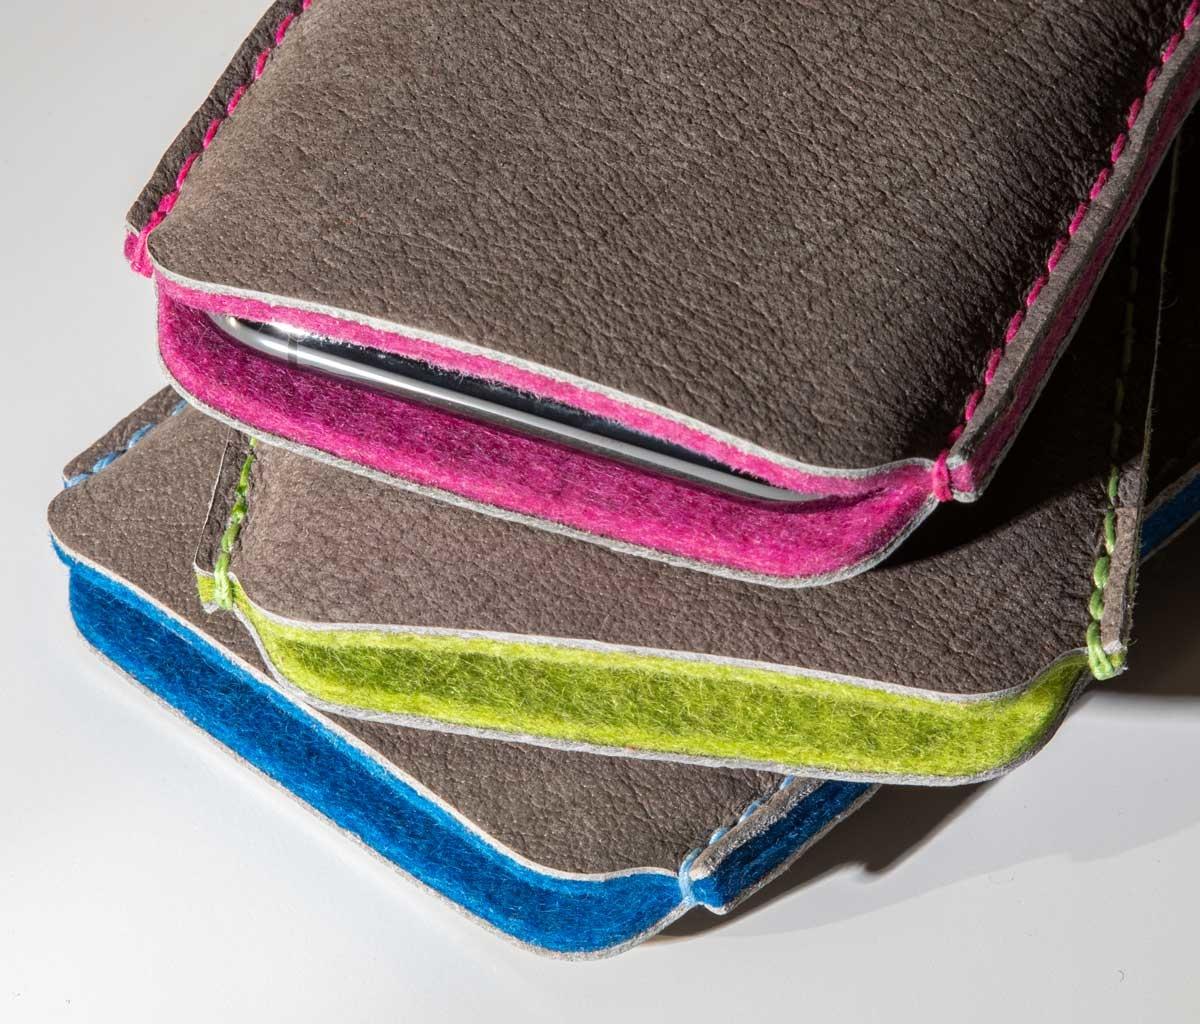 iPhone 13 12 11 Pro Max mini SE Leder Hülle mit farbenfrohem Innenfutter aus Filz SCHUTZPATRON